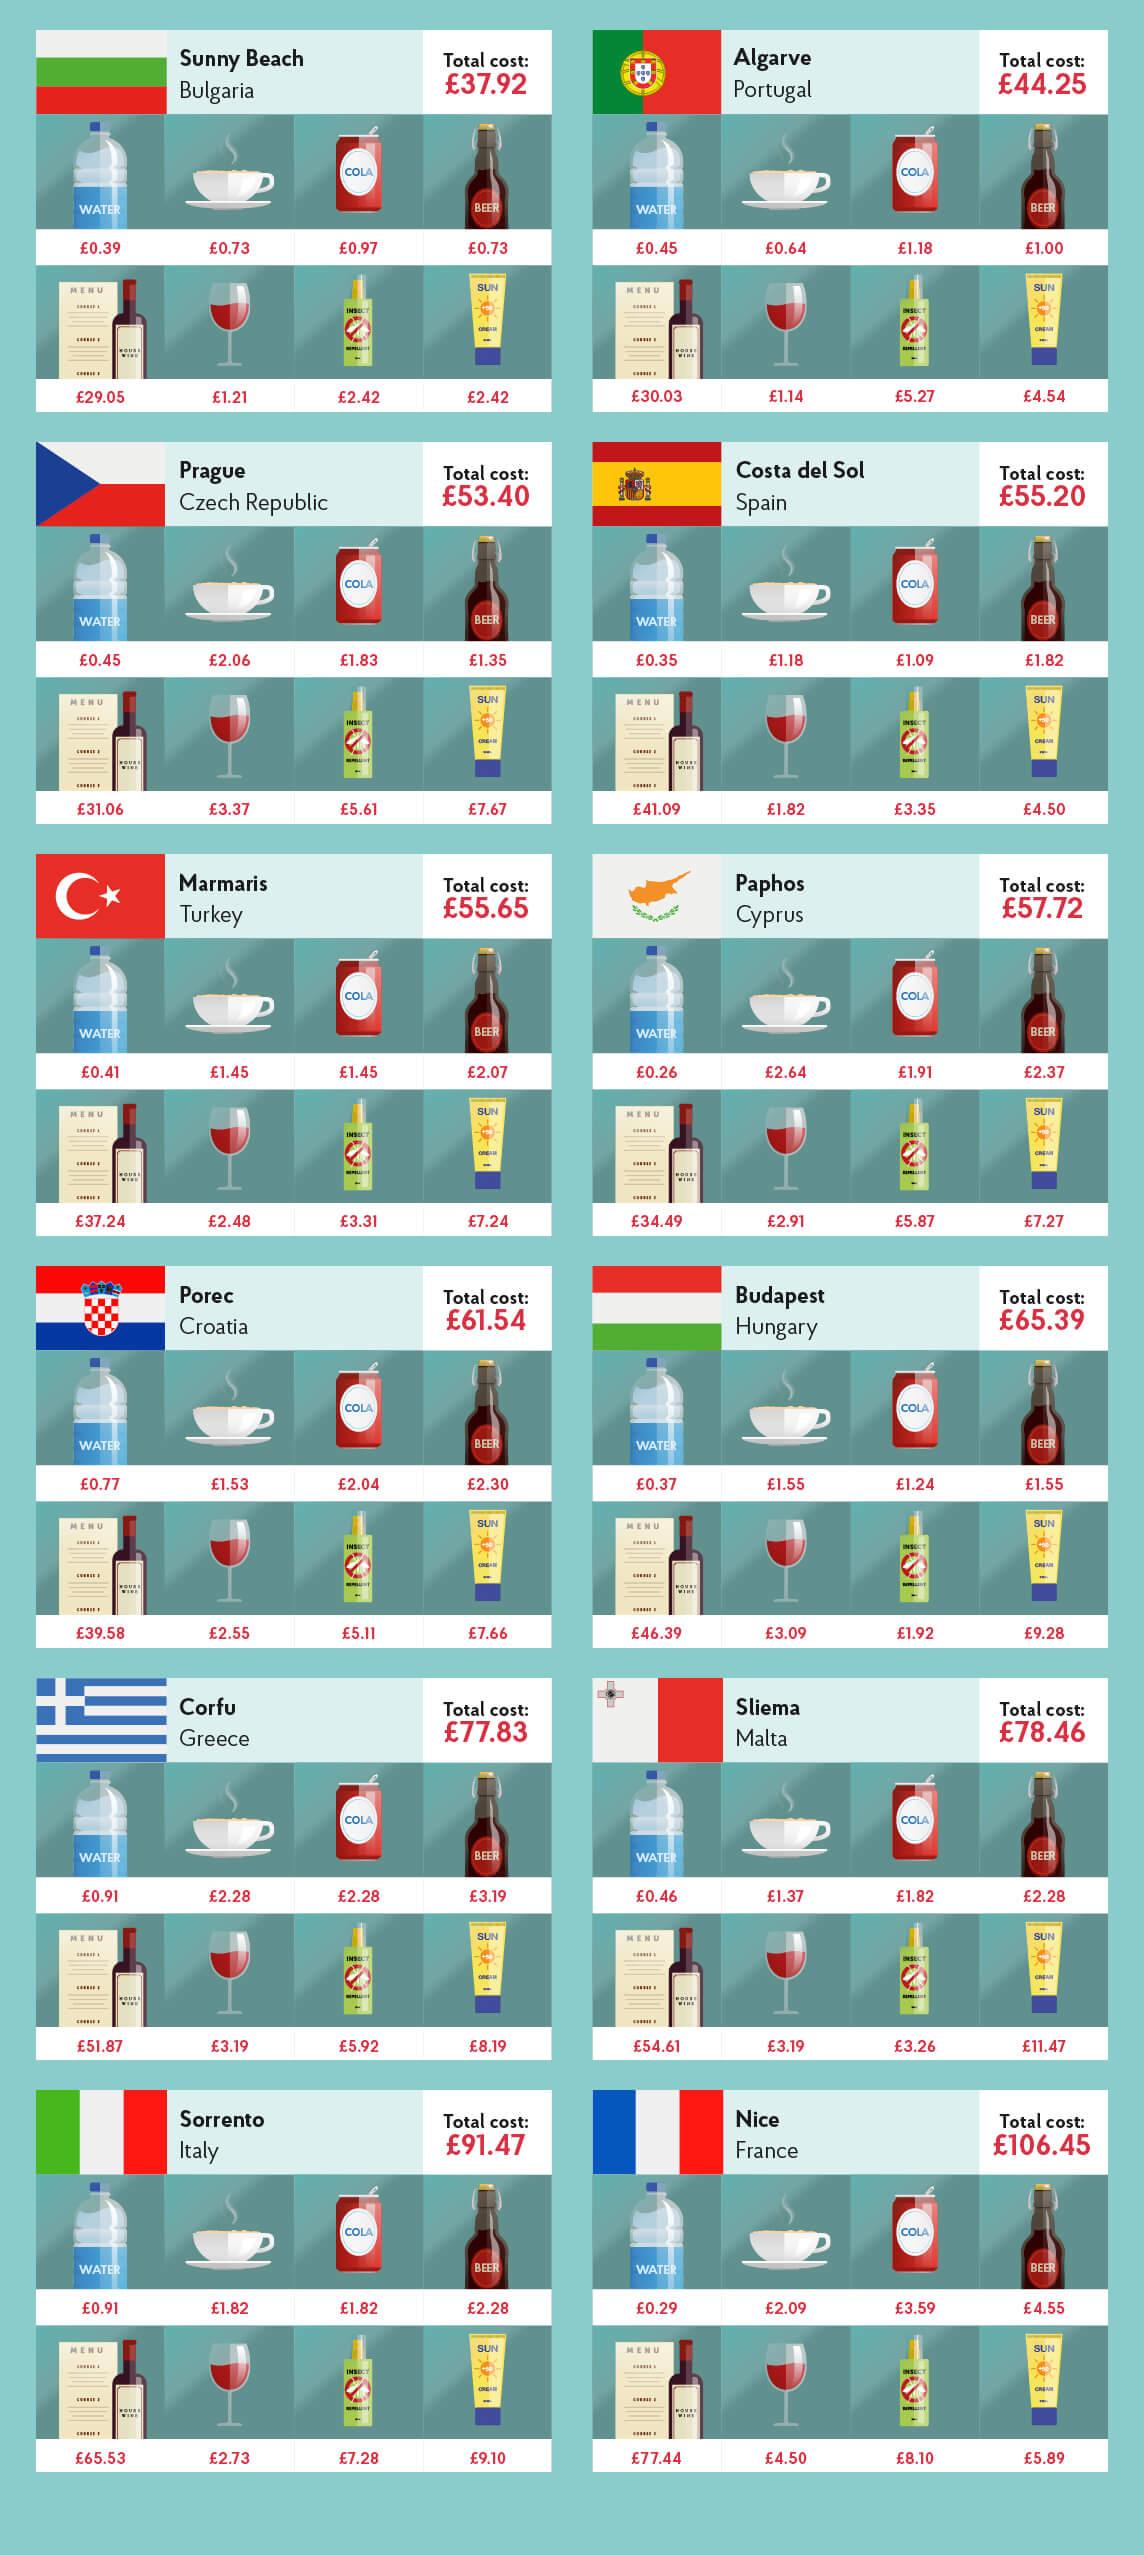 Travel Money 2018 - Top European destinations